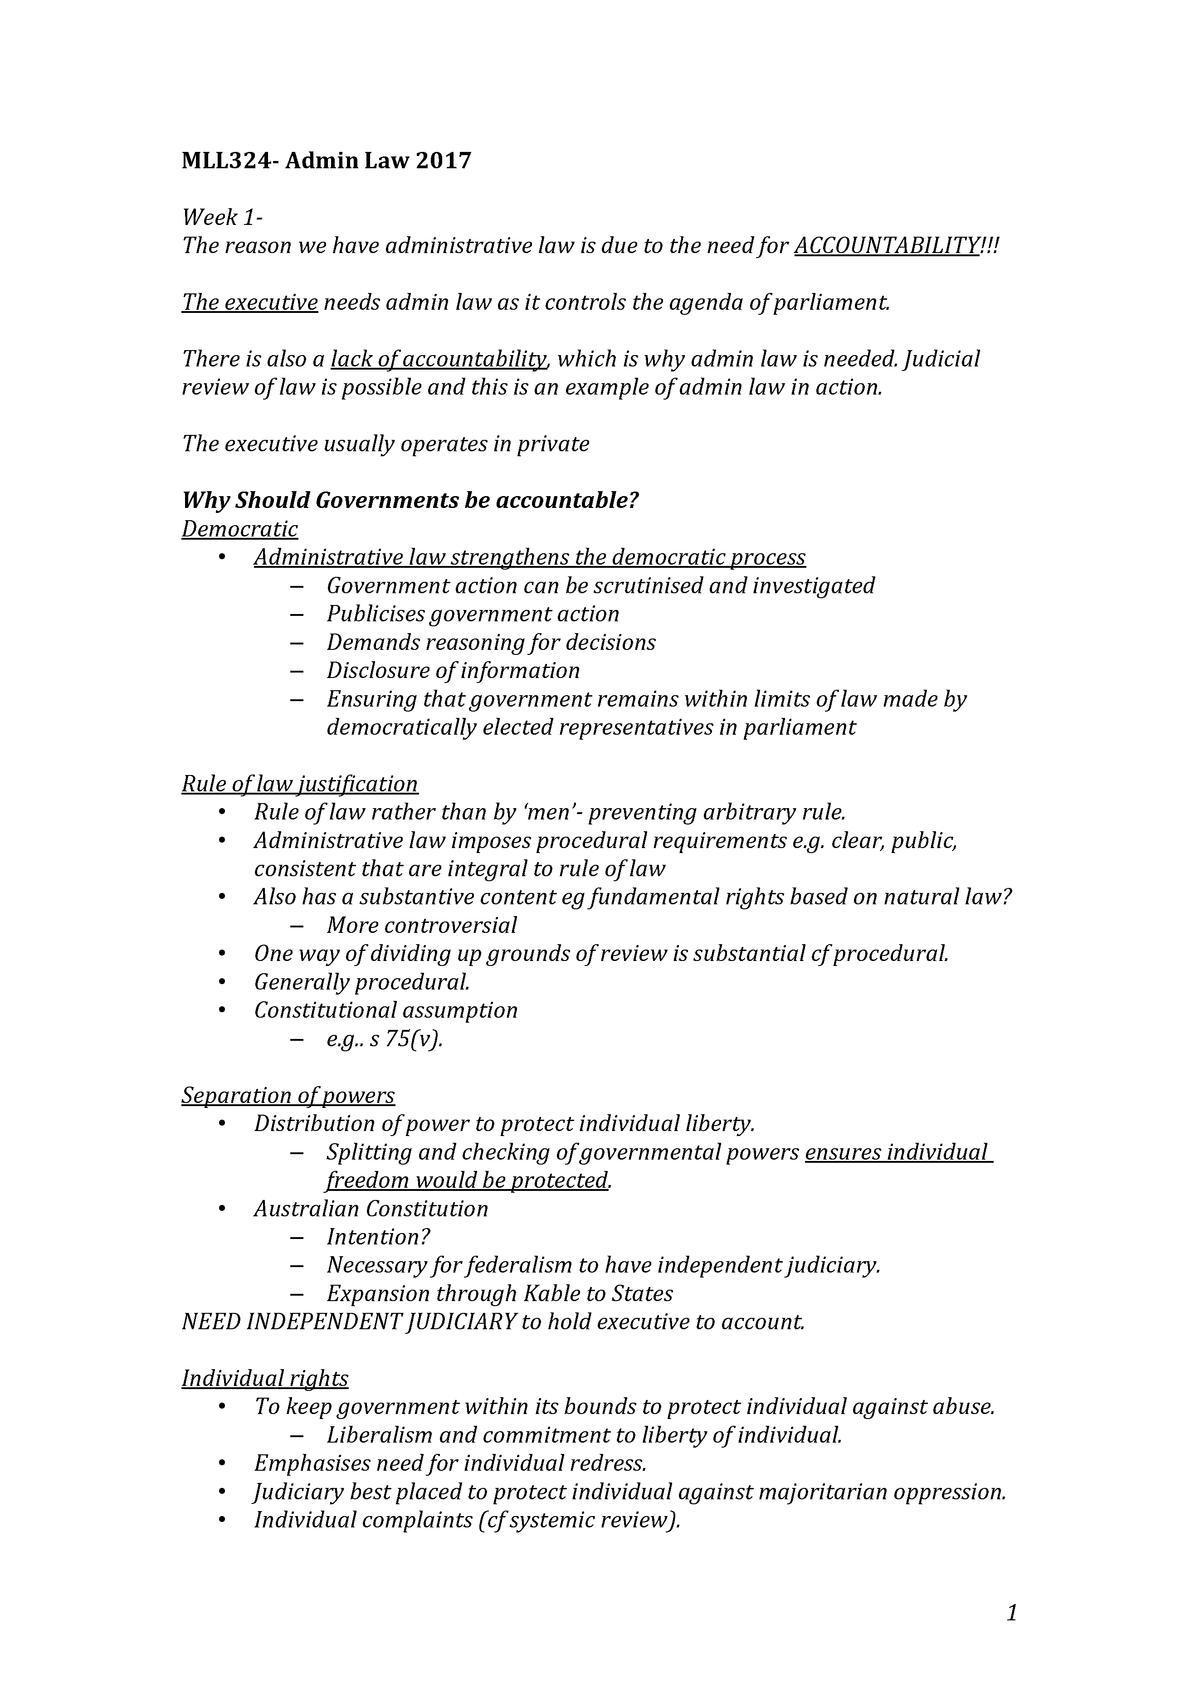 MLL324- Administrative Law - MLL111 Bachelor of Laws - StuDocu